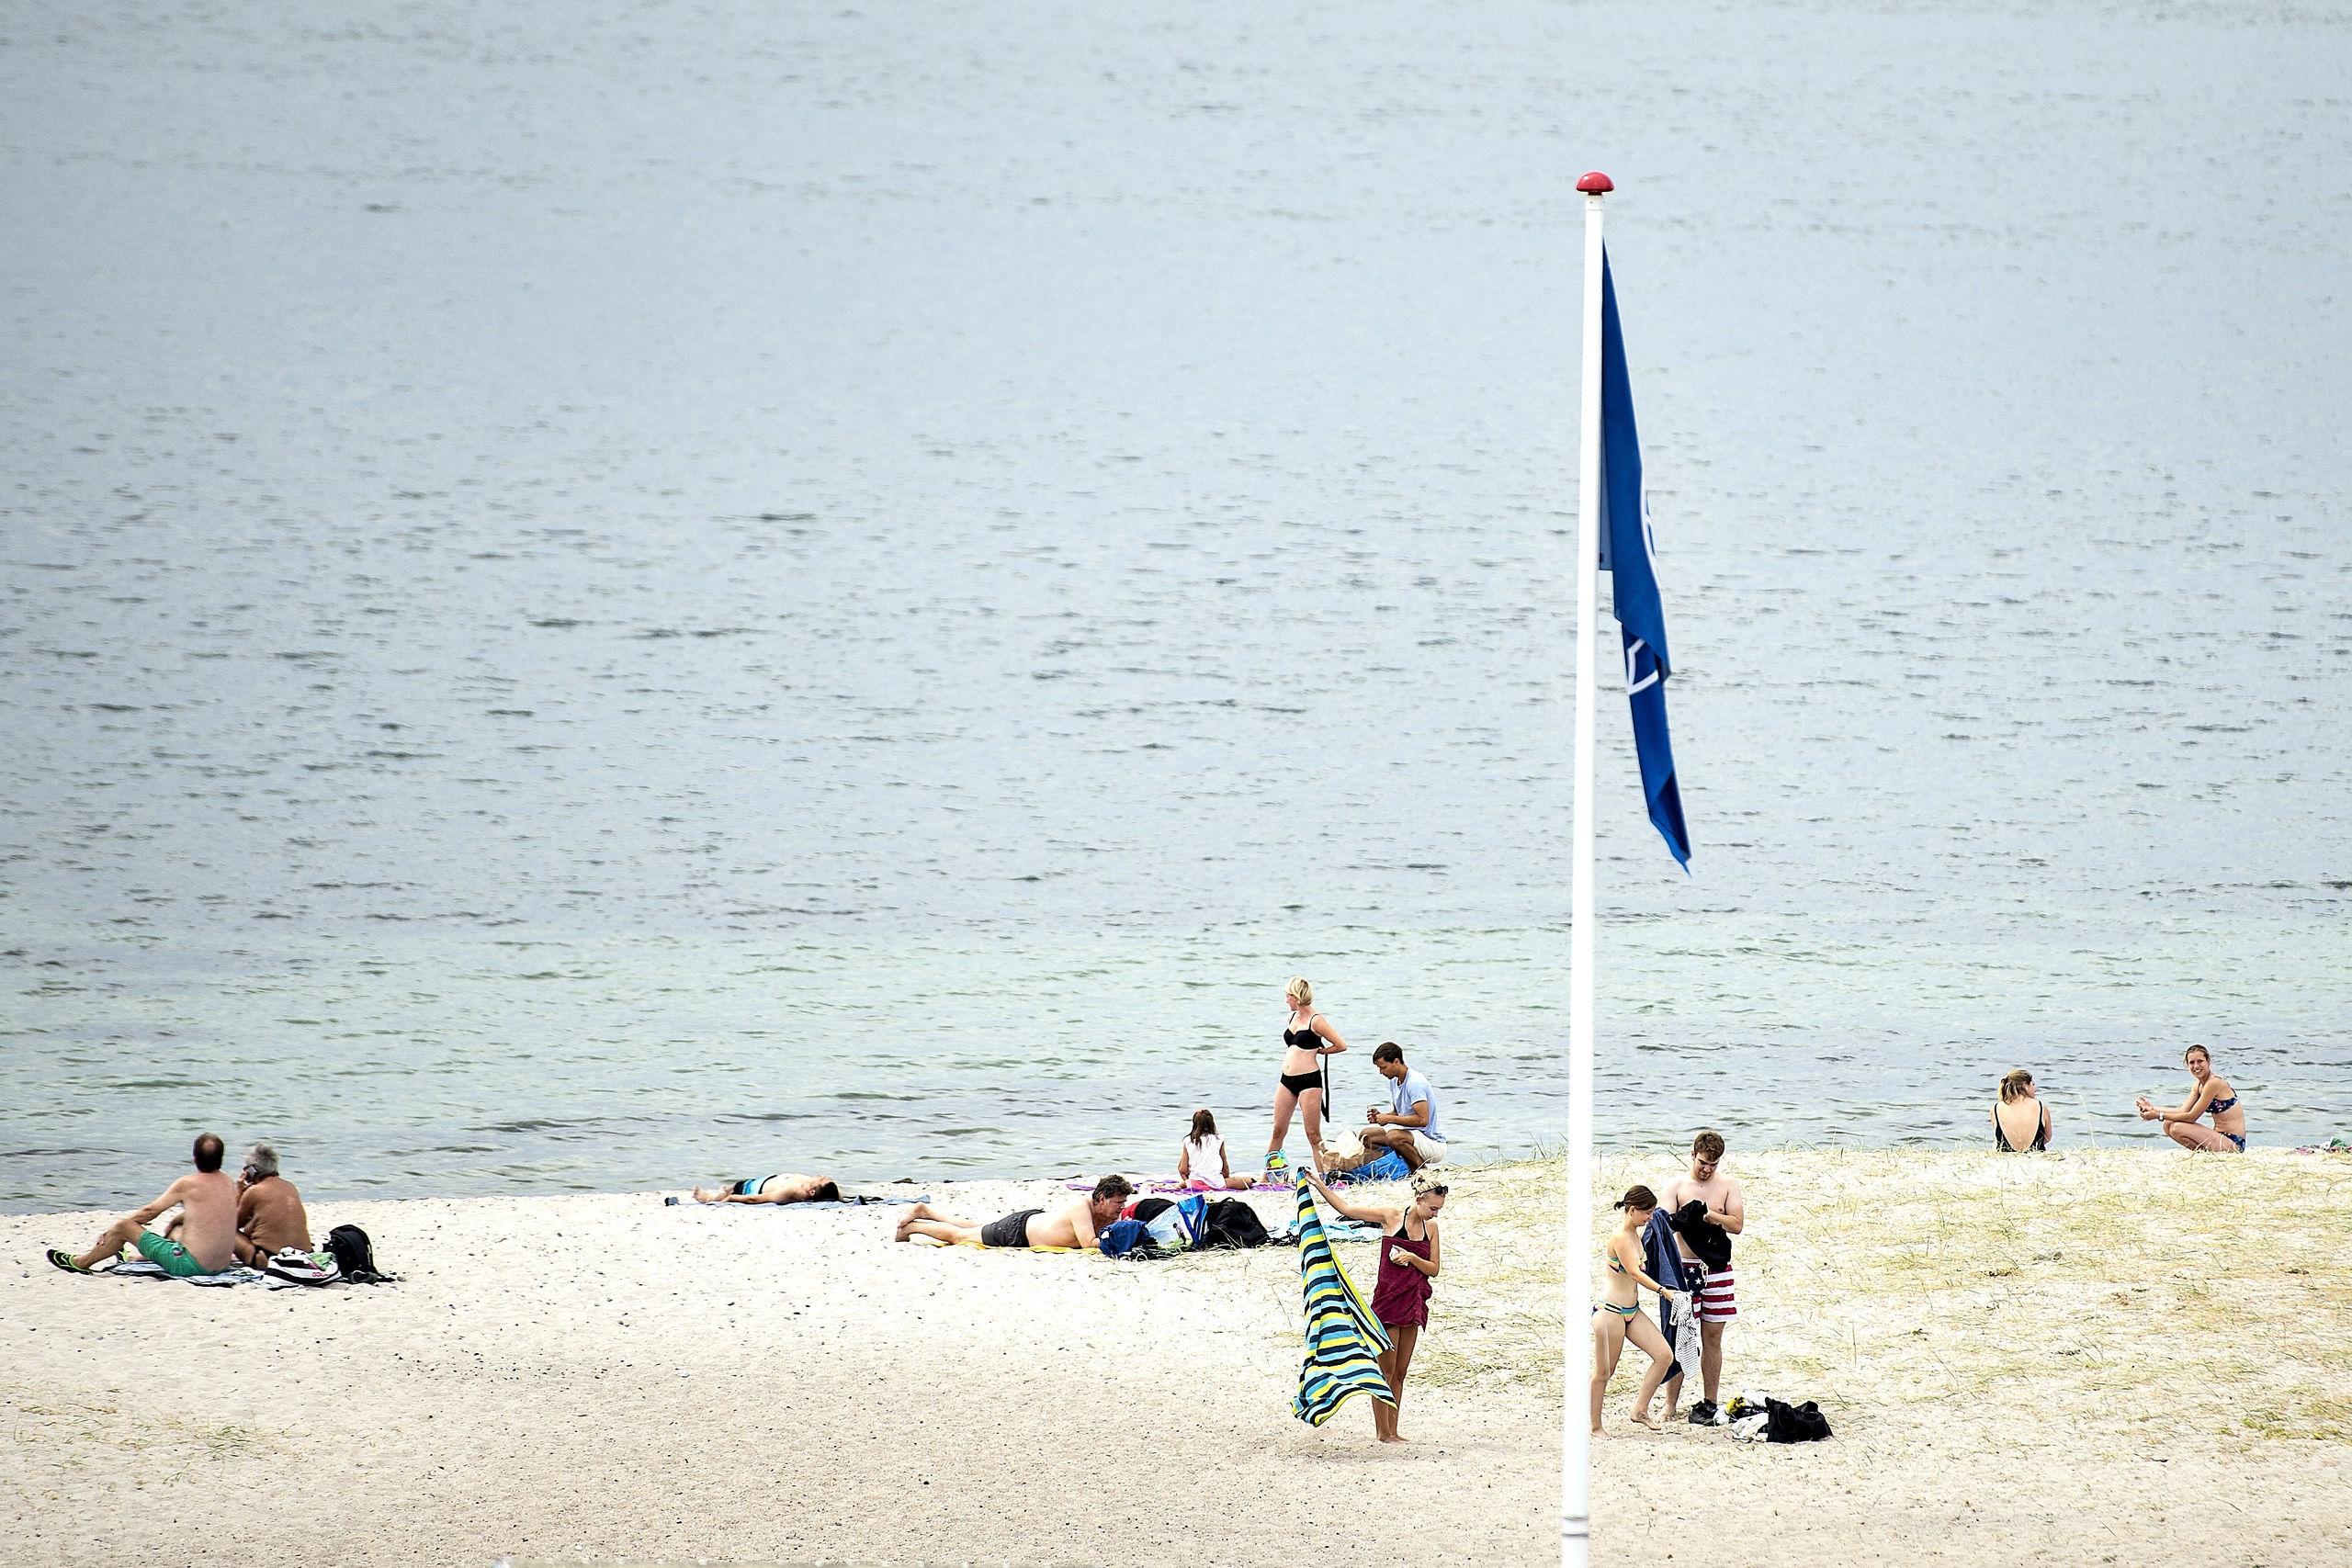 højeste temperatur i danmark